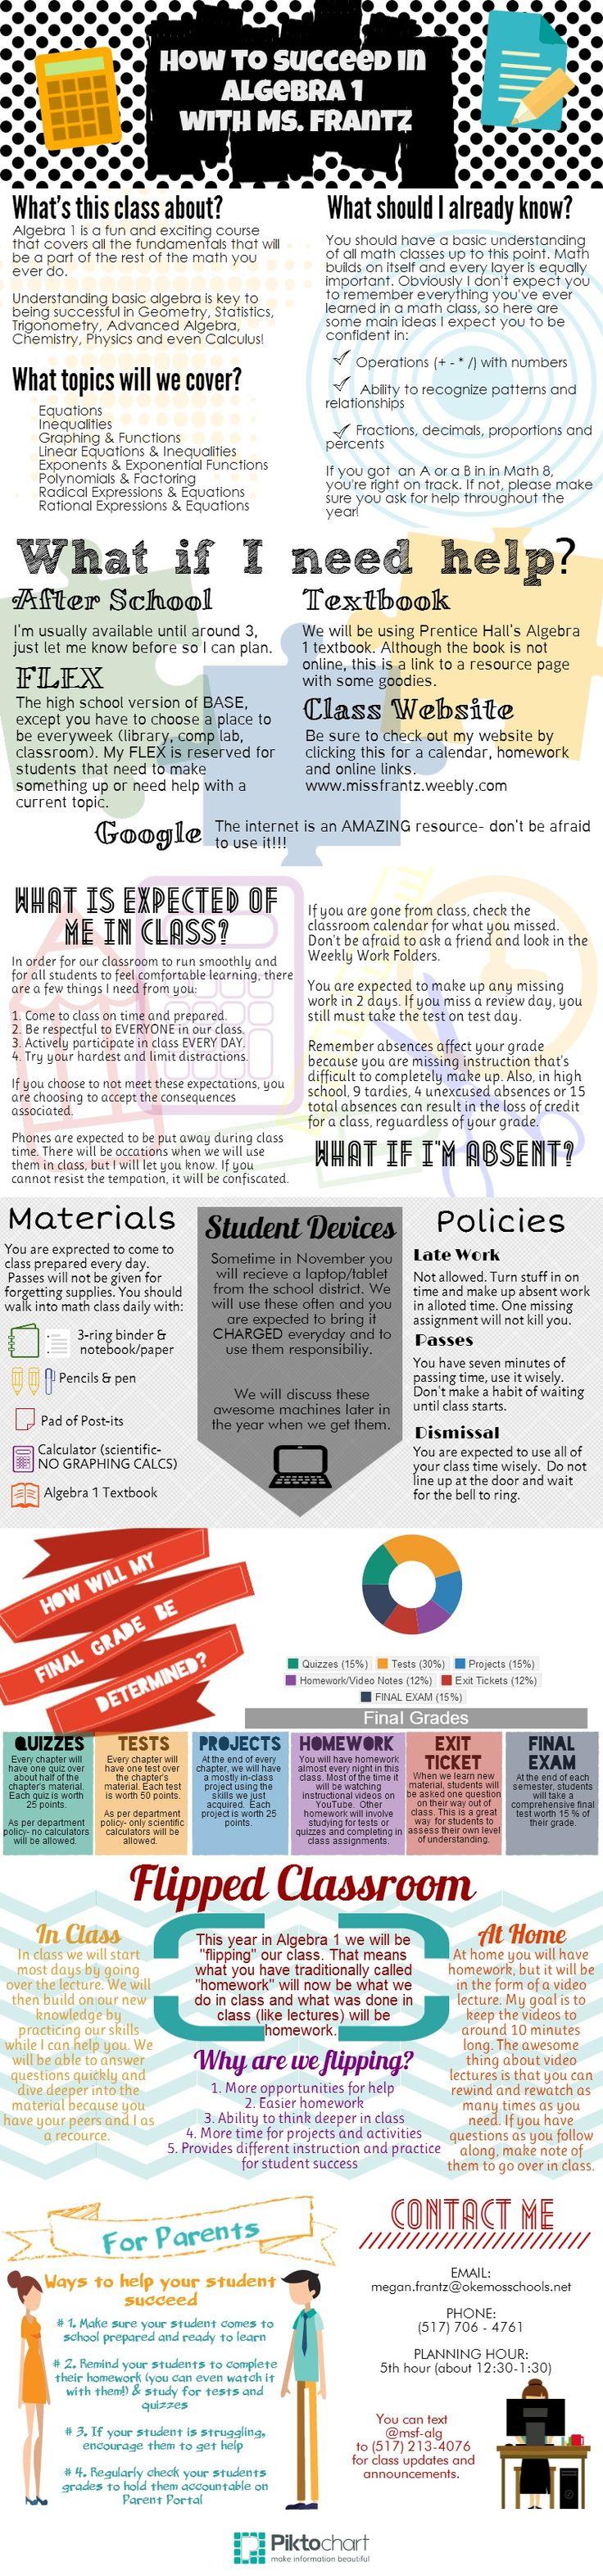 Ms. Frantz's Algebra 1 Syllabus   Piktochart Infographic Editor